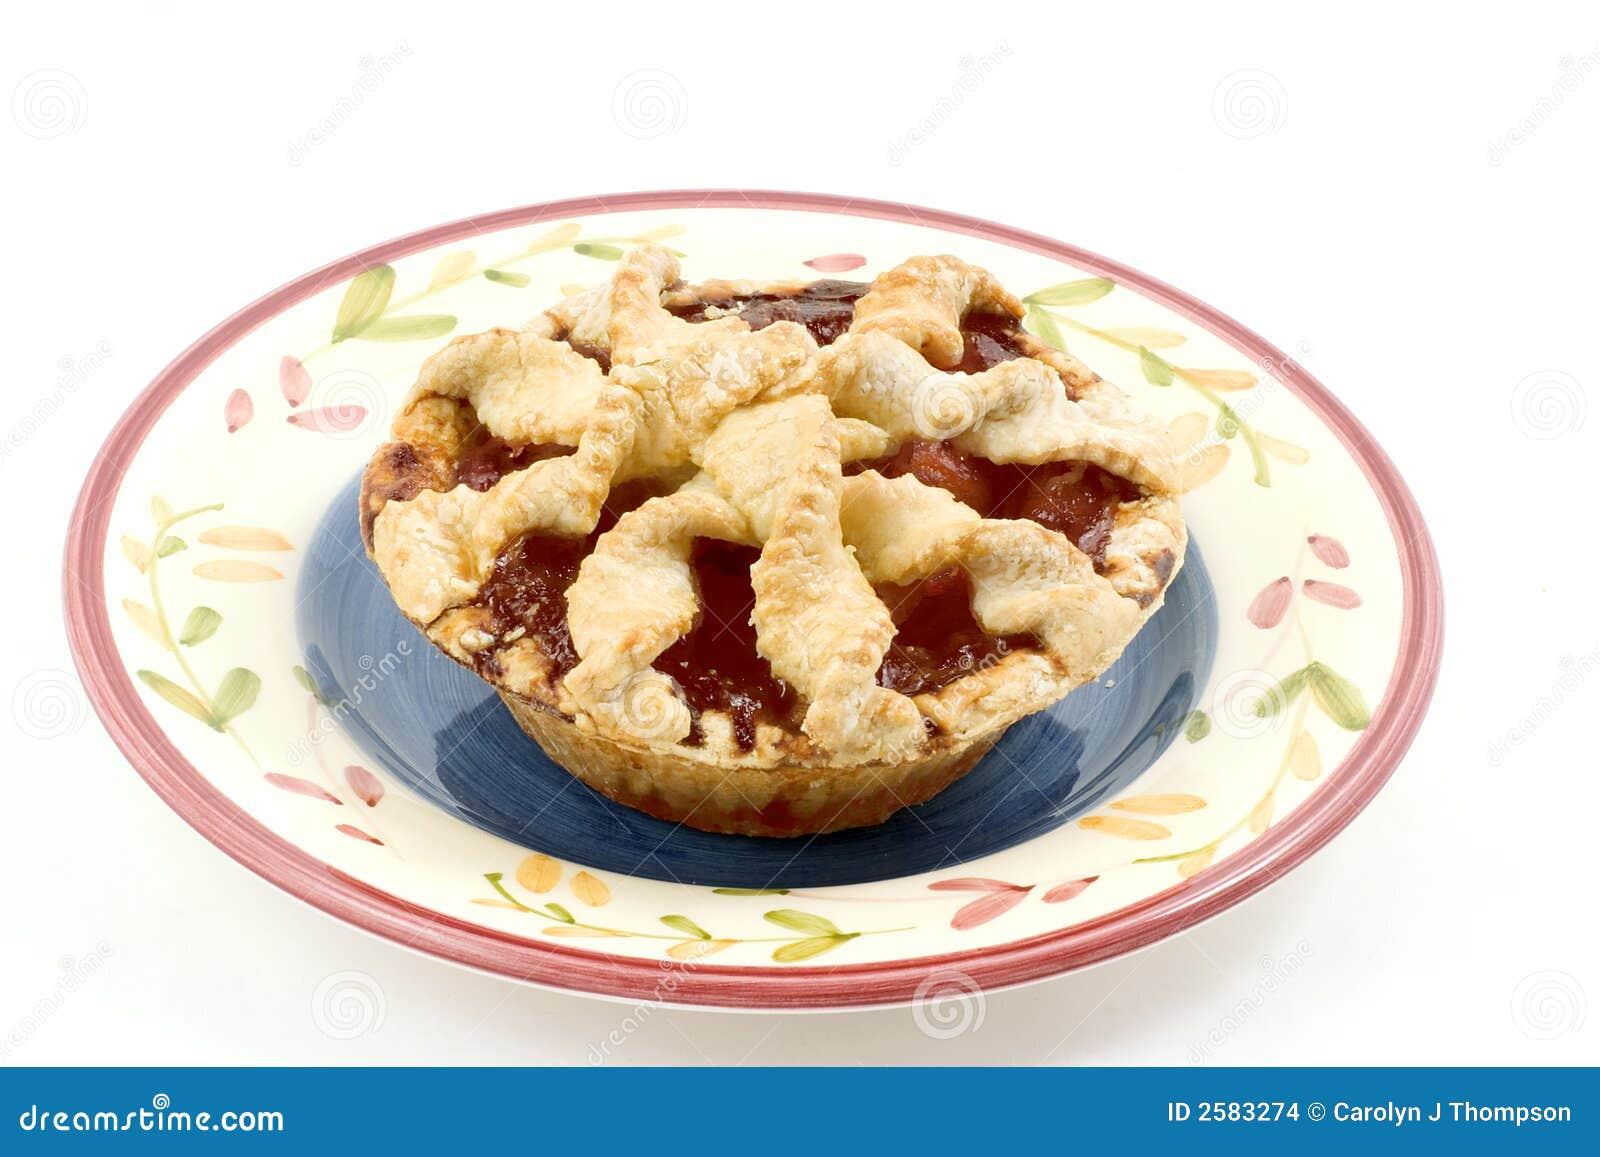 Cherry Peach Pie Stock Images - Image: 2583274